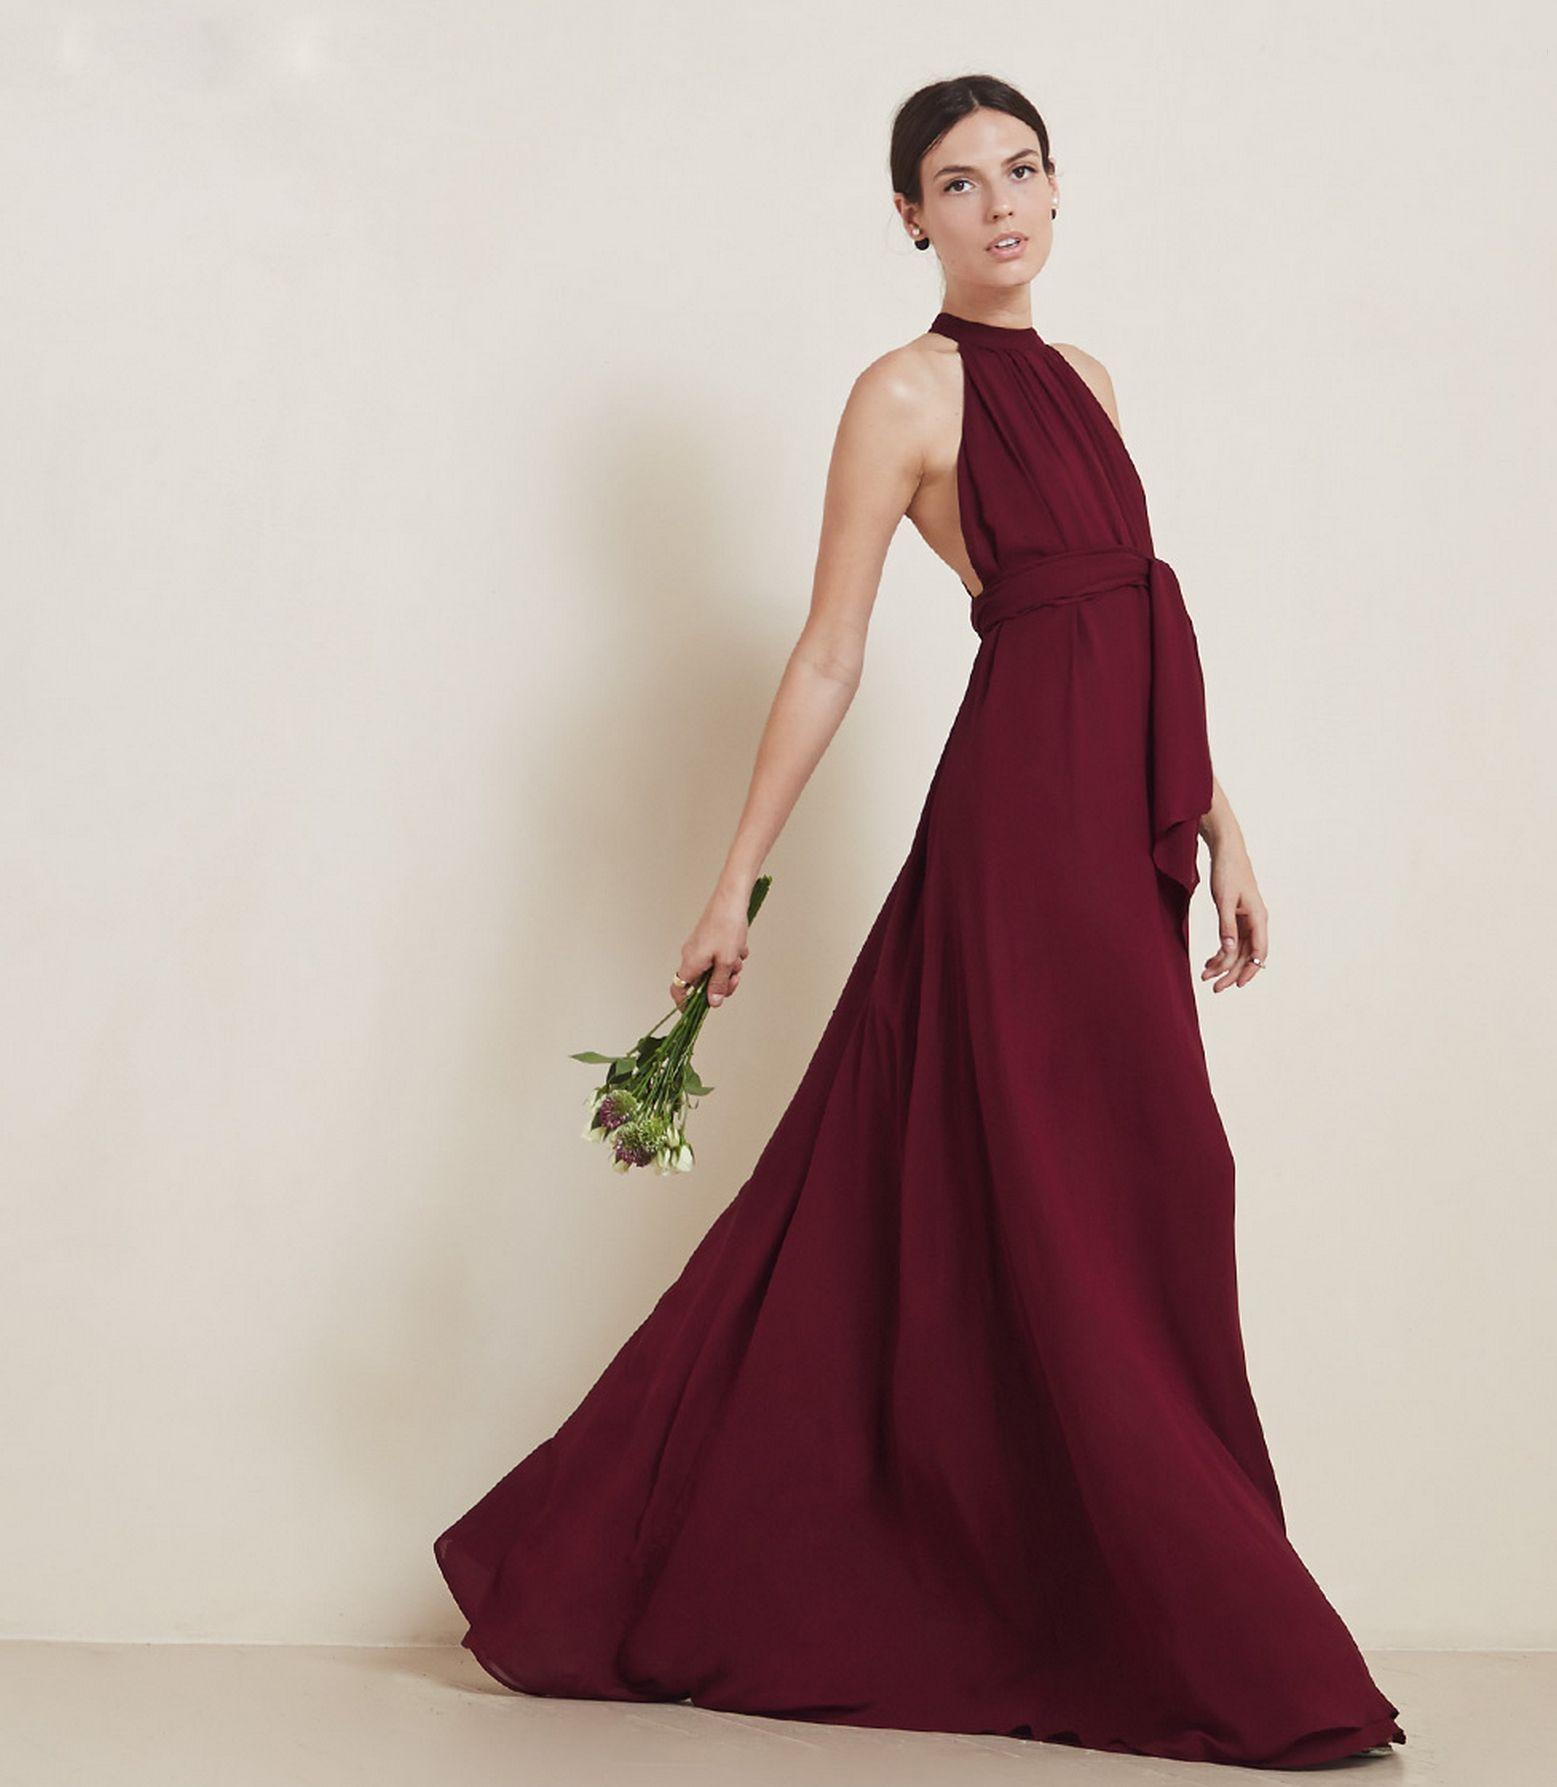 merlot bridesmaid dresses - Google Search - jamies wedding ...